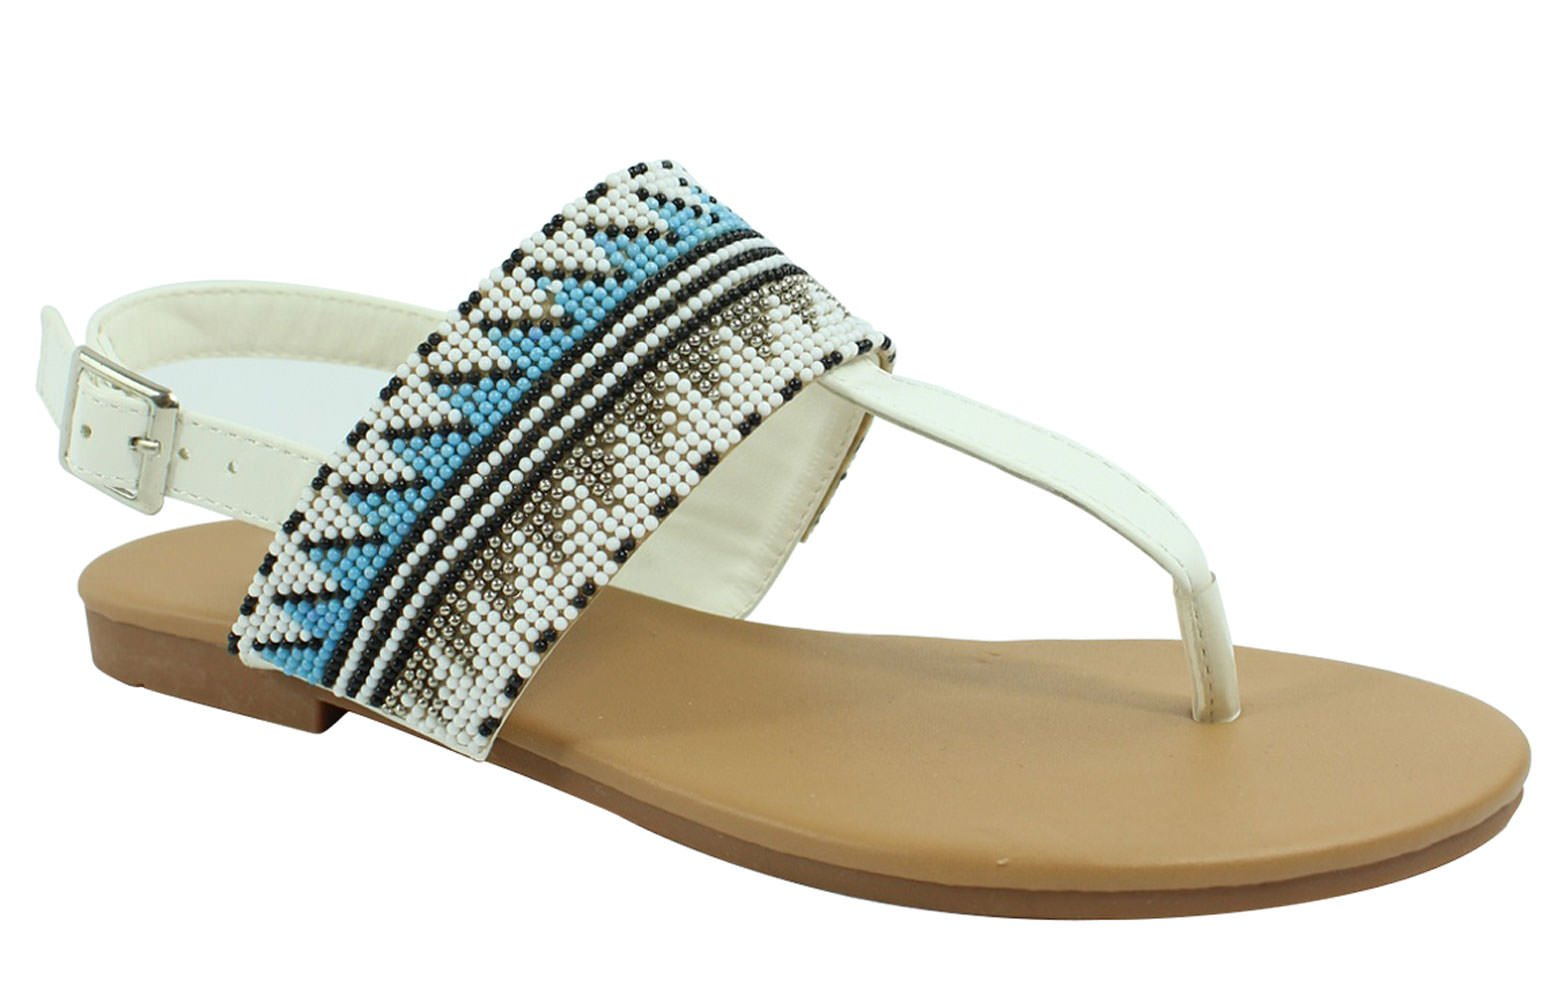 Top Selling White Gladiator Ankle Strap Open Toe Flat Slip On Hippy Modern Lightweight Classic Indian Ethnic Women Summer Bohemia Flower Beaded Flip-Flop Sandal Shoe for Sale Ladies (Size 7, White)